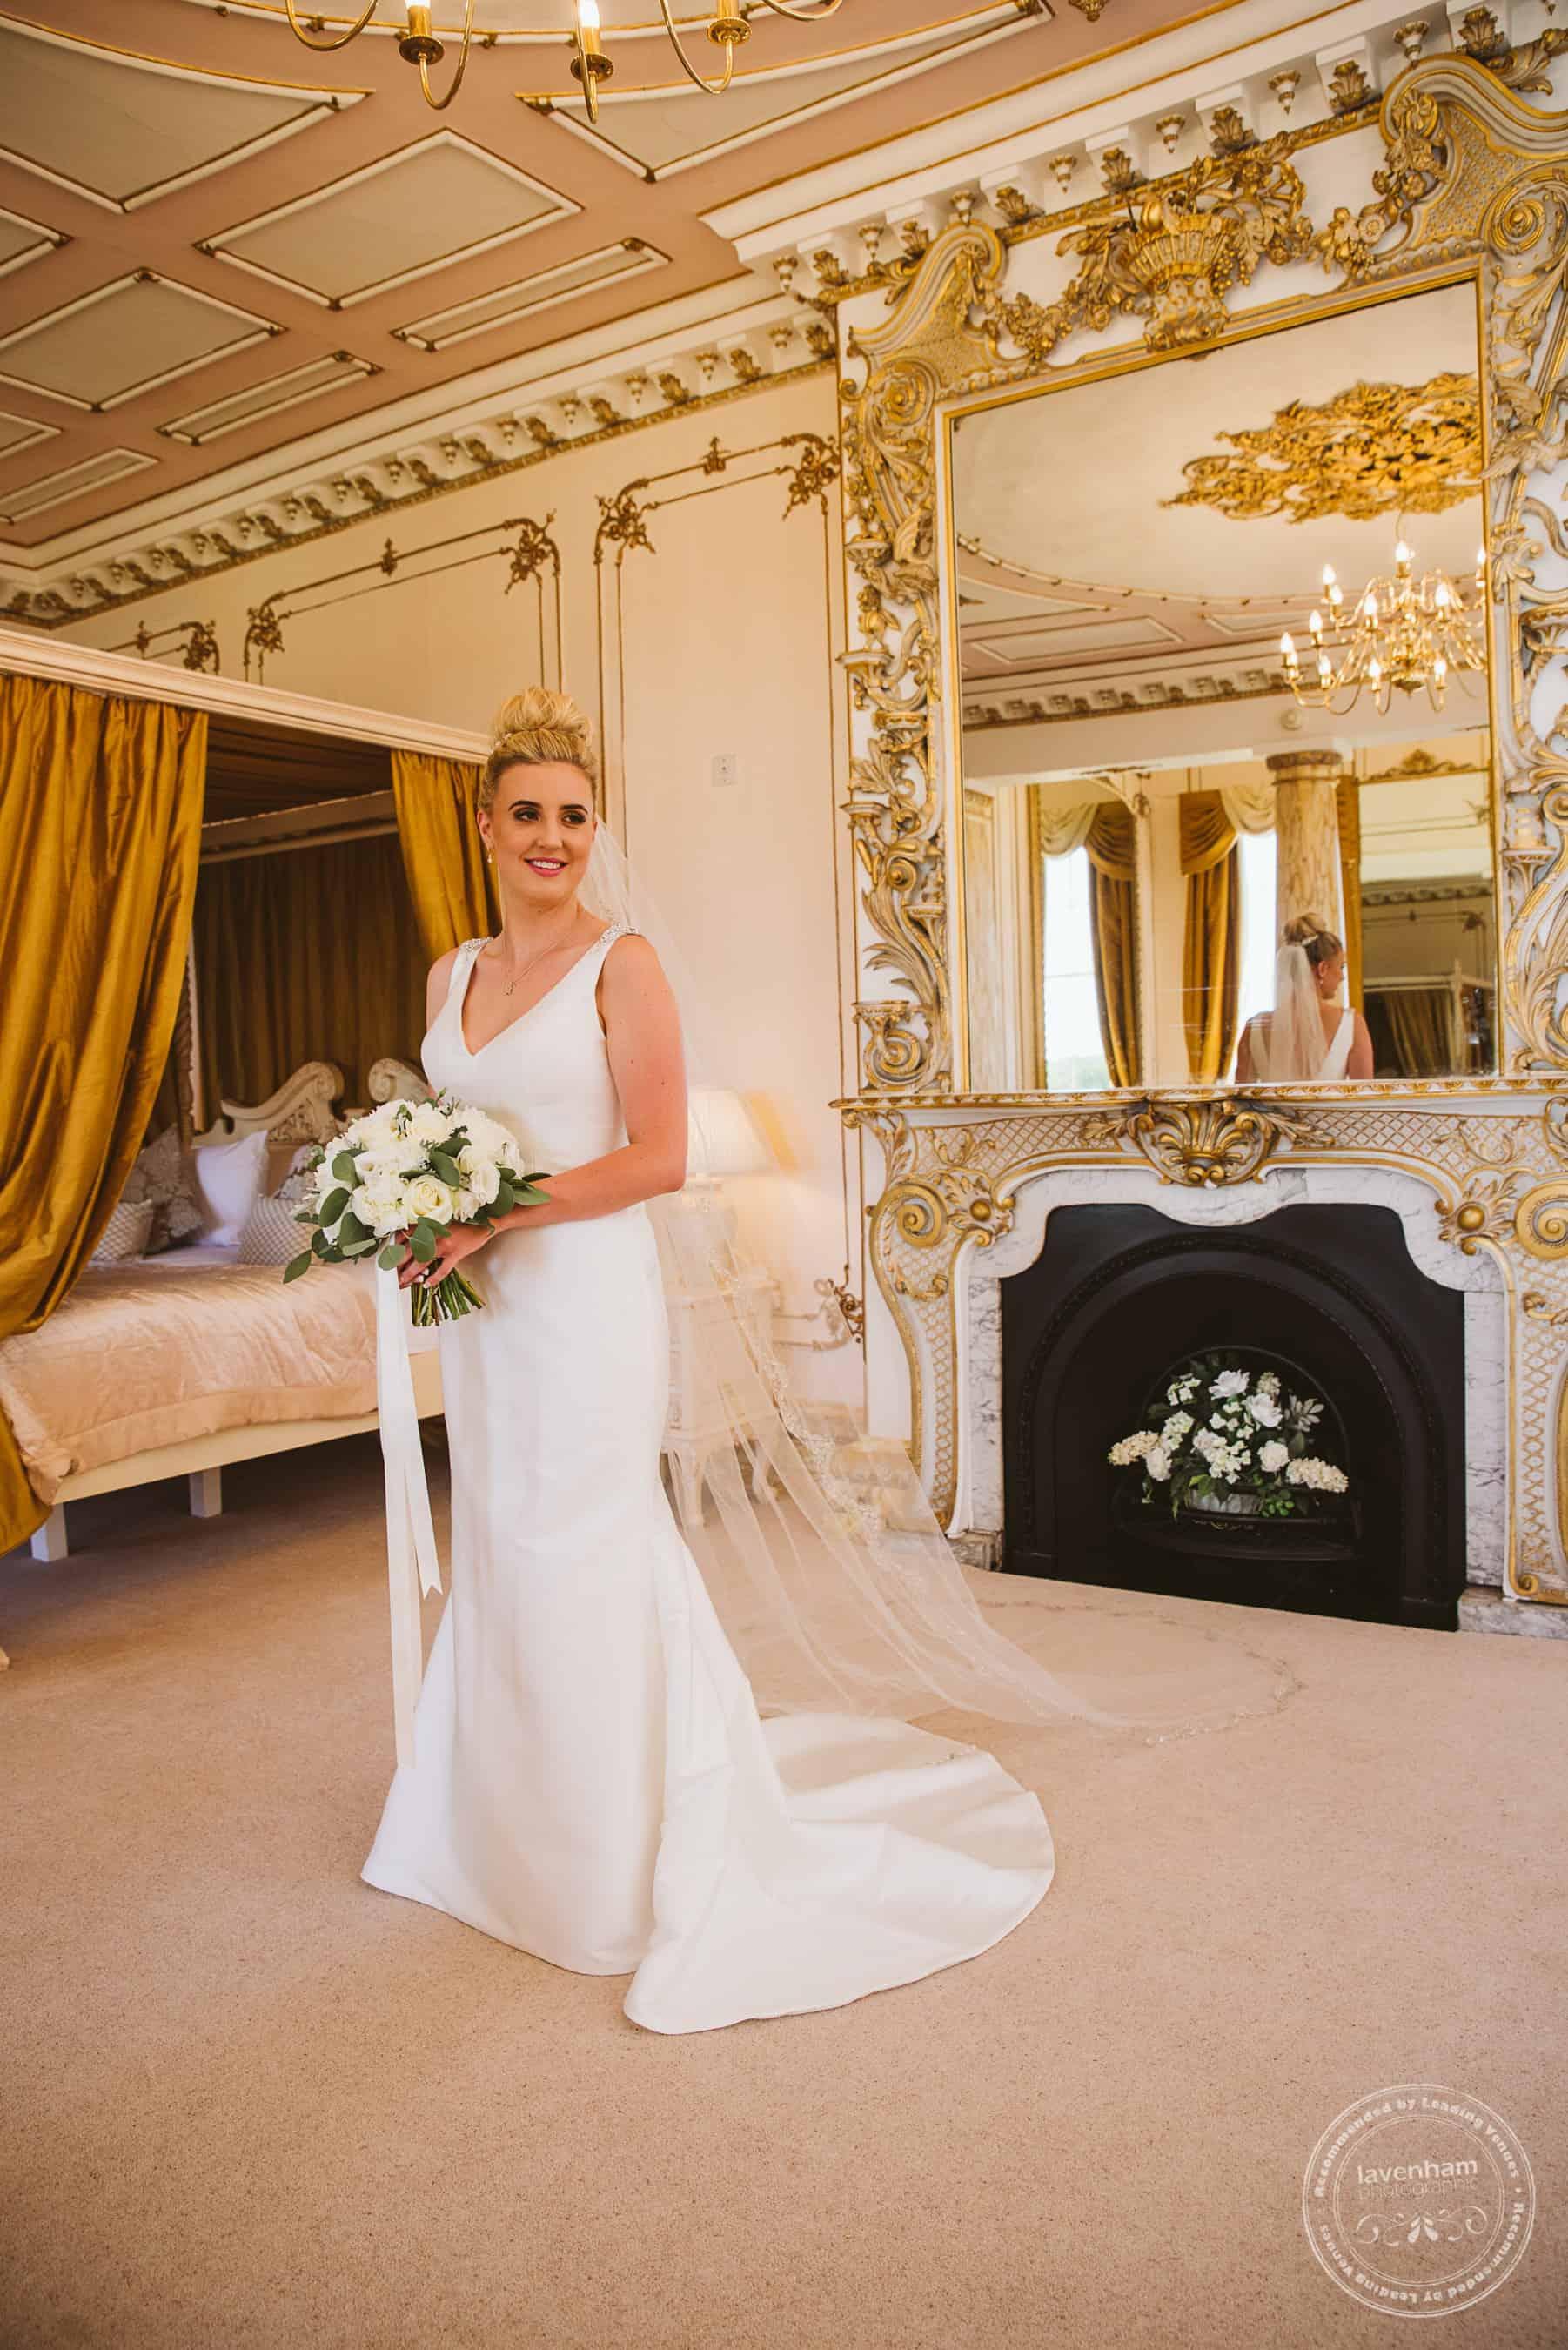 220618 Gosfield Hall Wedding Photography Lavenham Photographic 0025